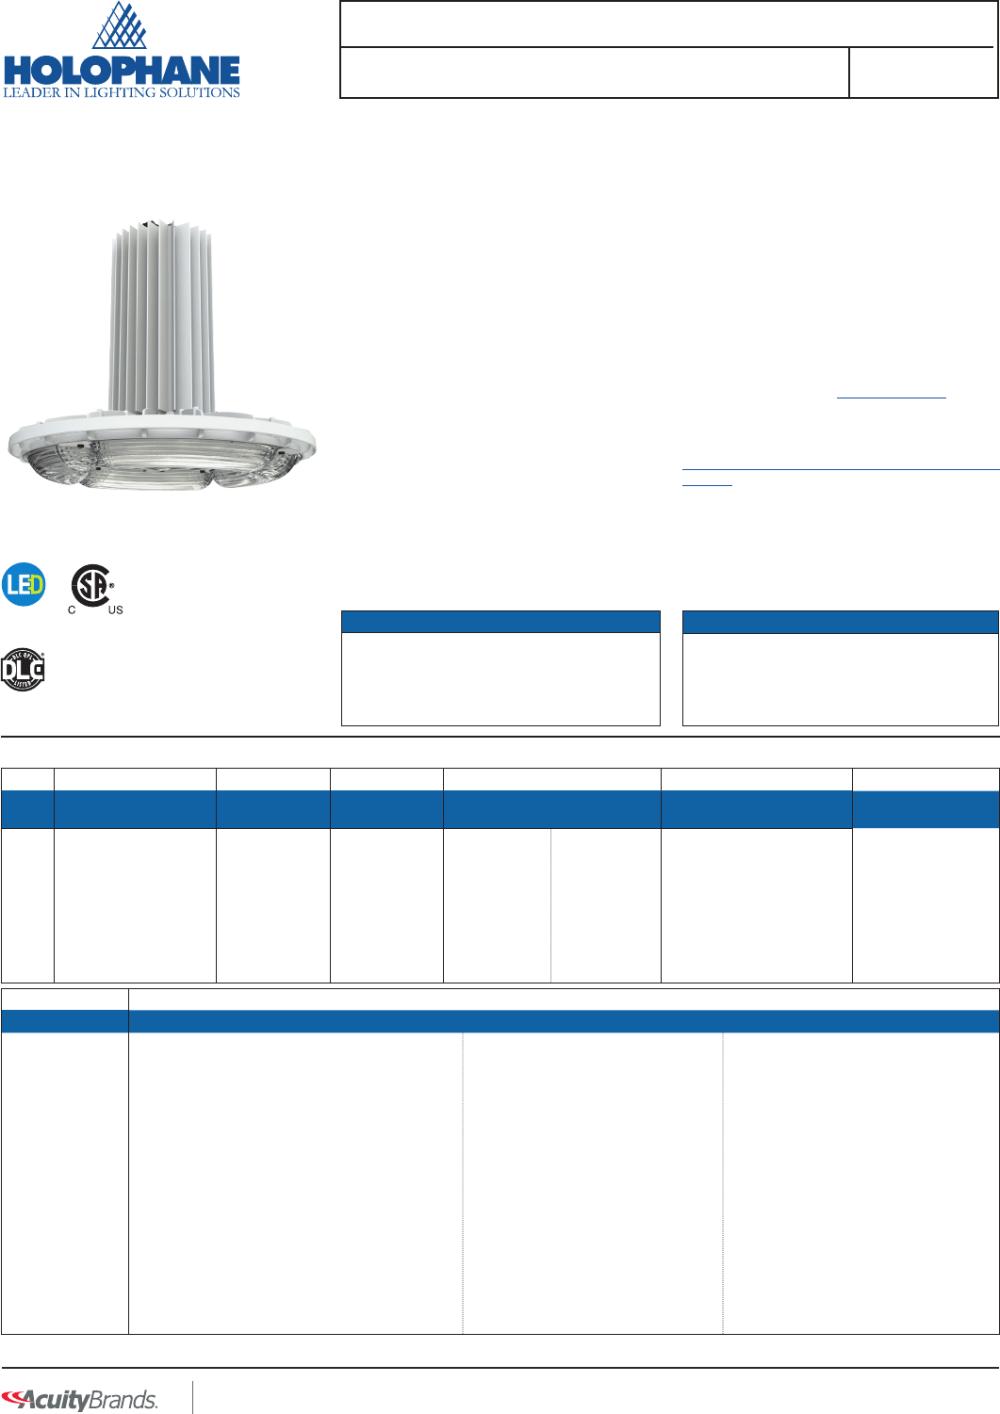 medium resolution of wrg 5624 holophane wiring diagram 277vholophane 3825 columbus rd granville oh 43023 phone